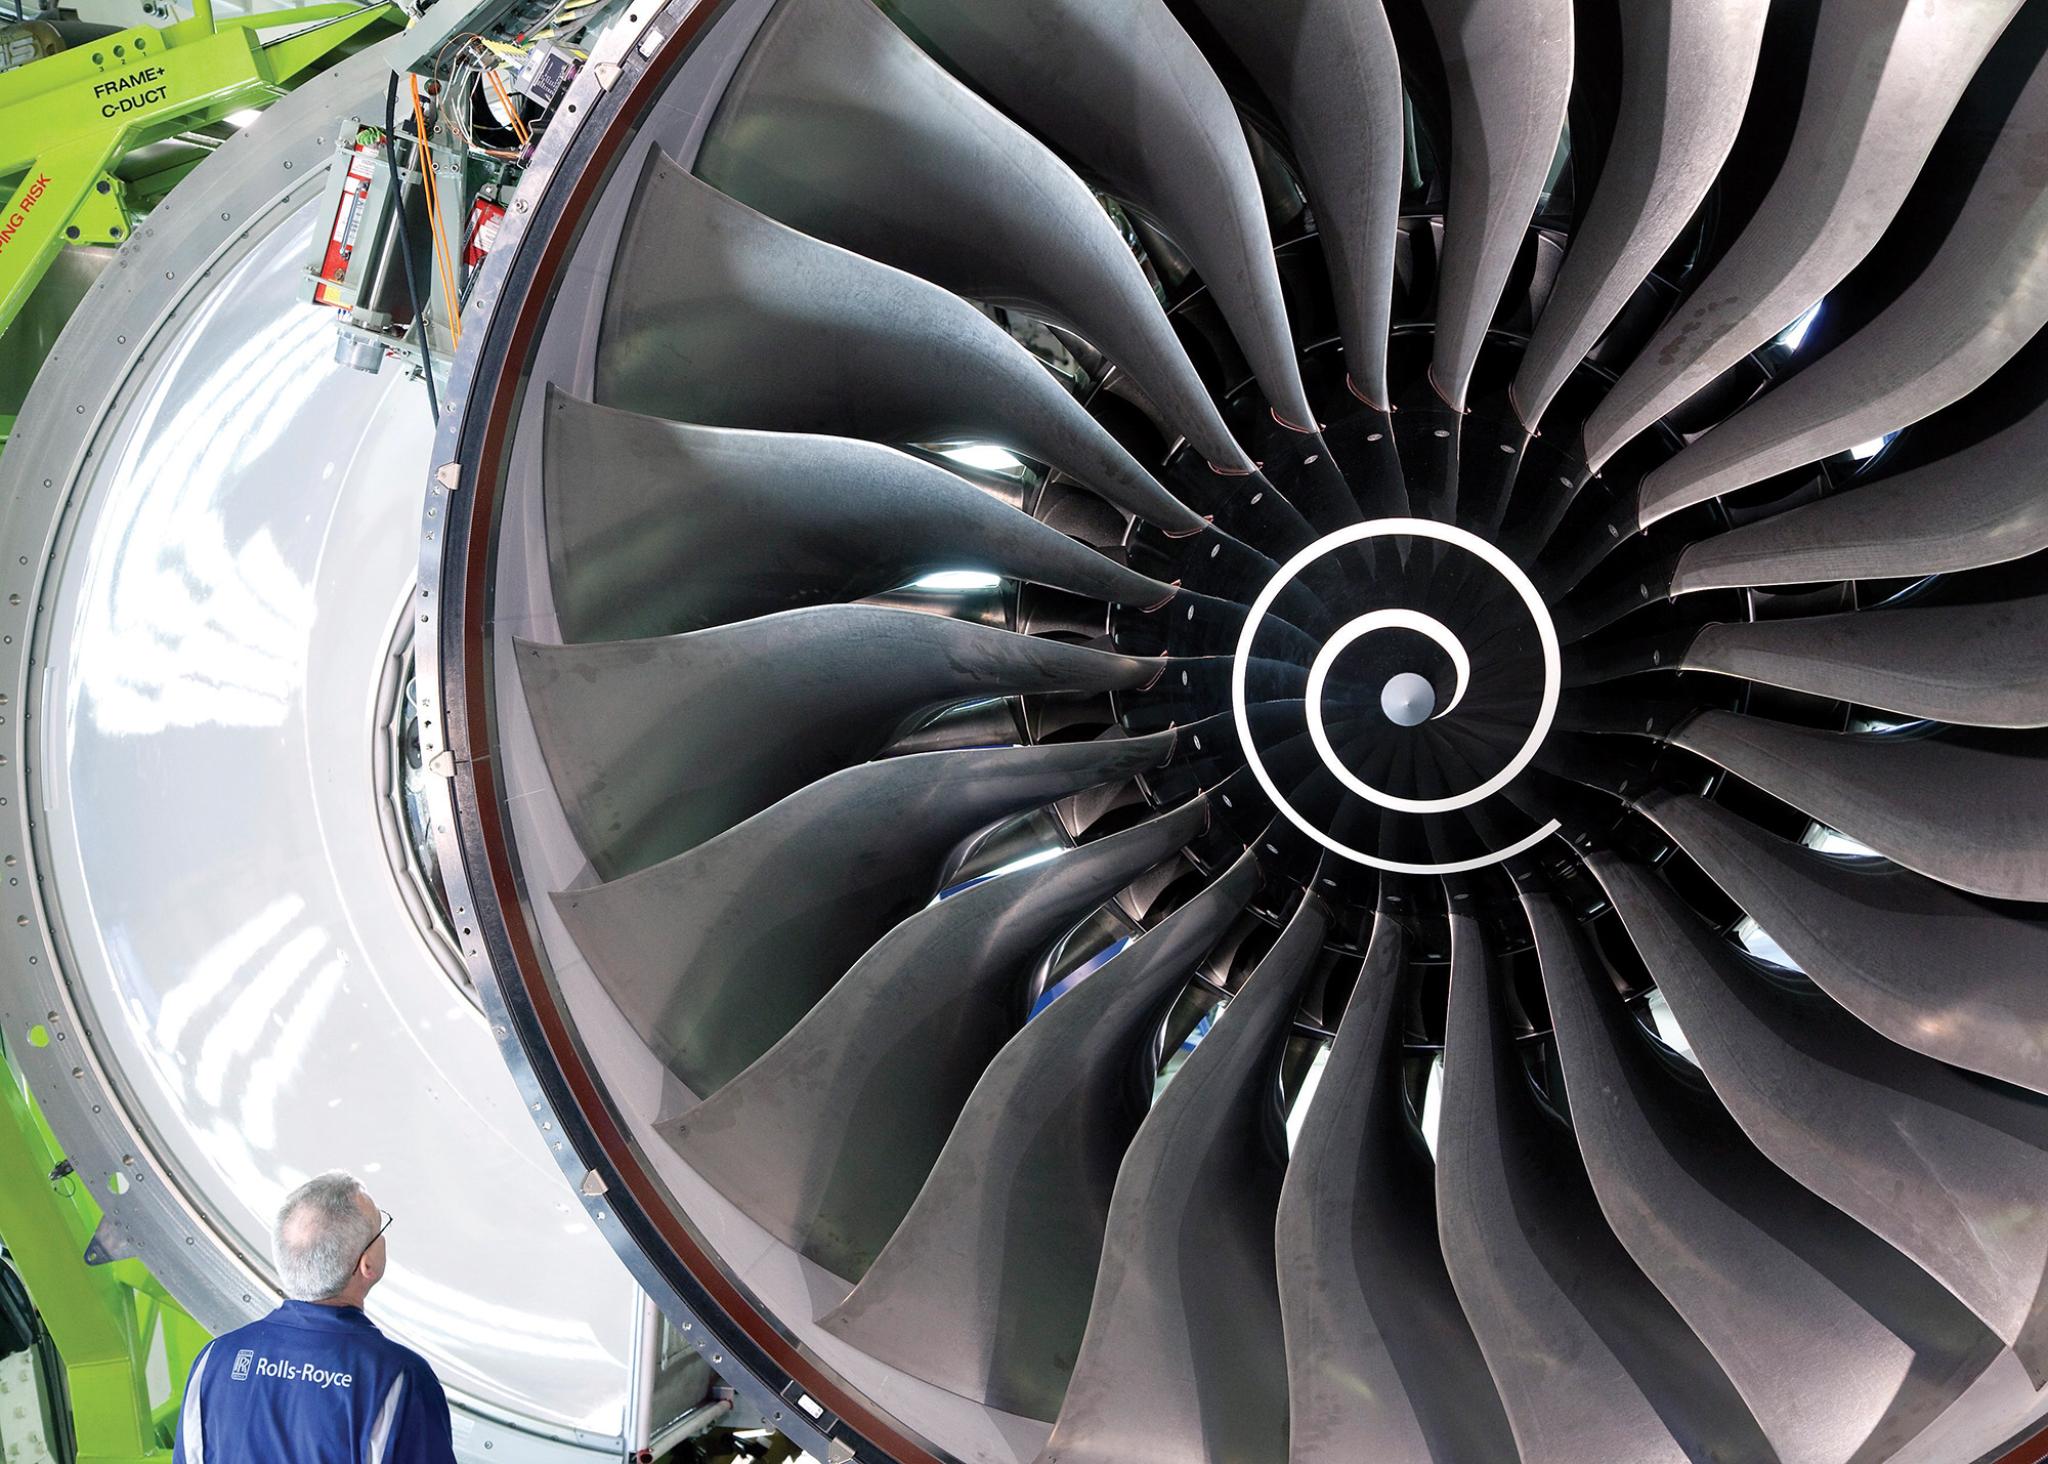 Rolls-Royce Engine (Rolls-Royce).jpg